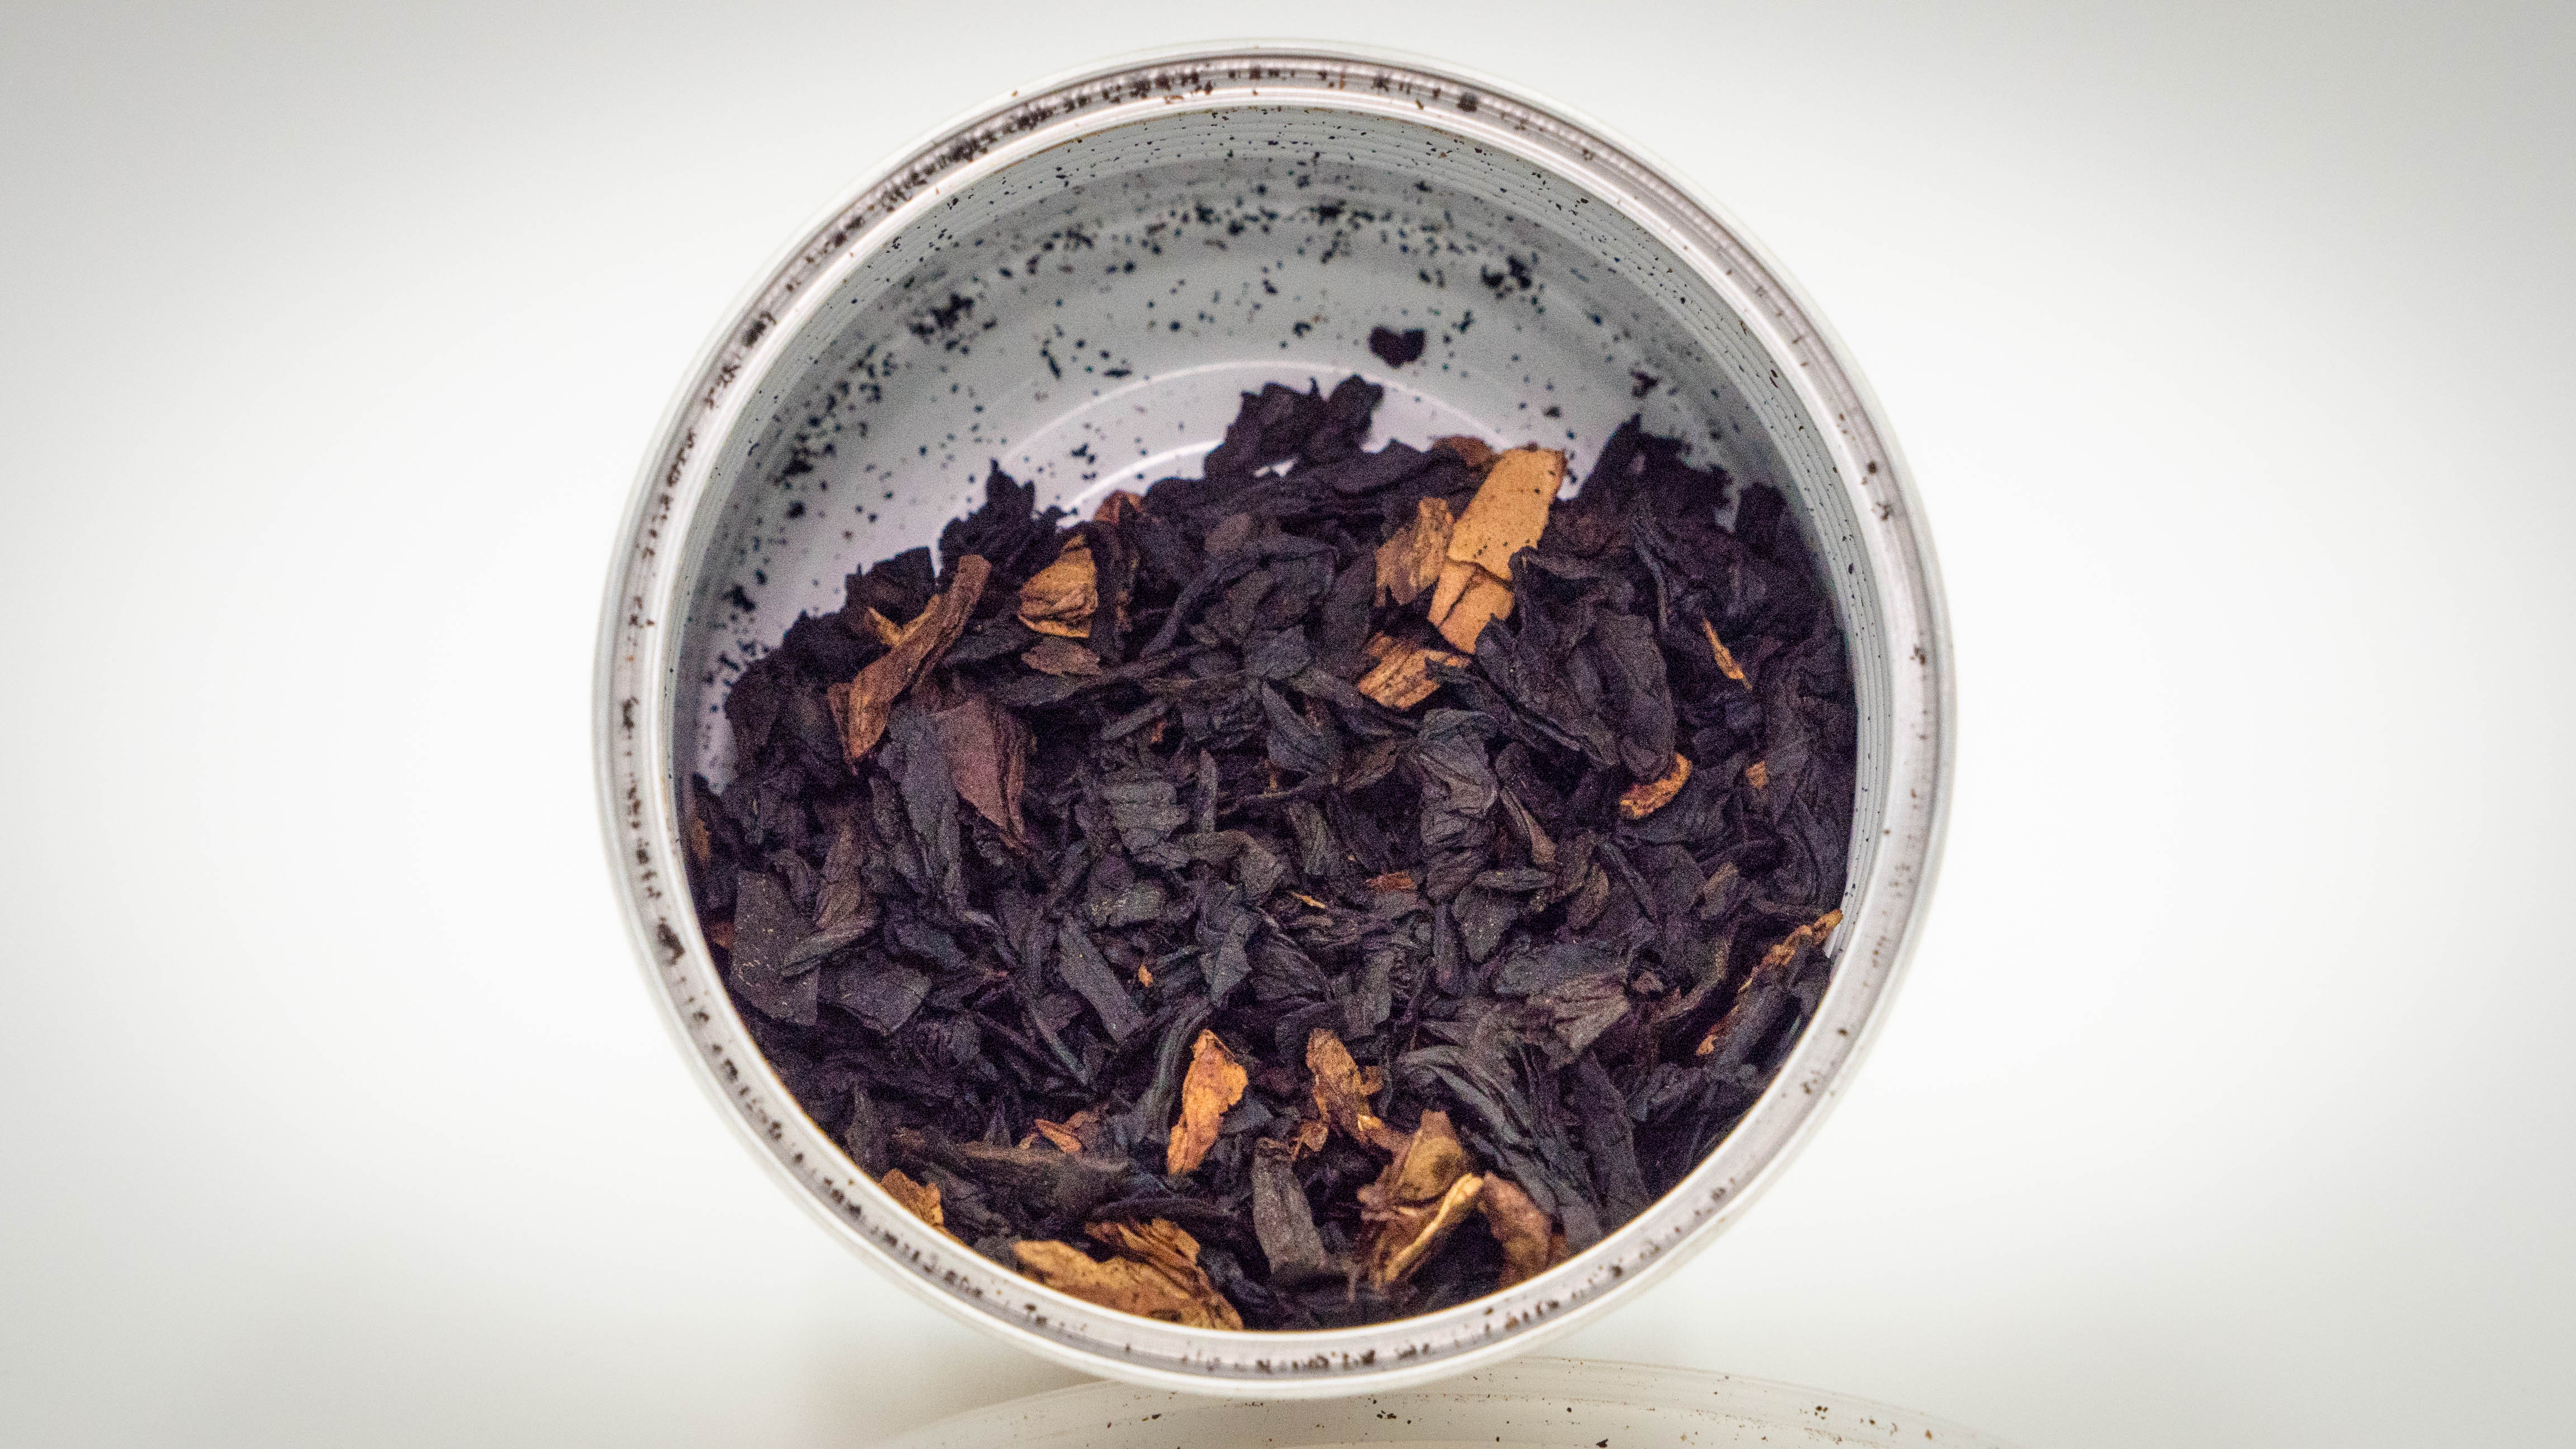 Mind Meld Carmel Nut Tobacco